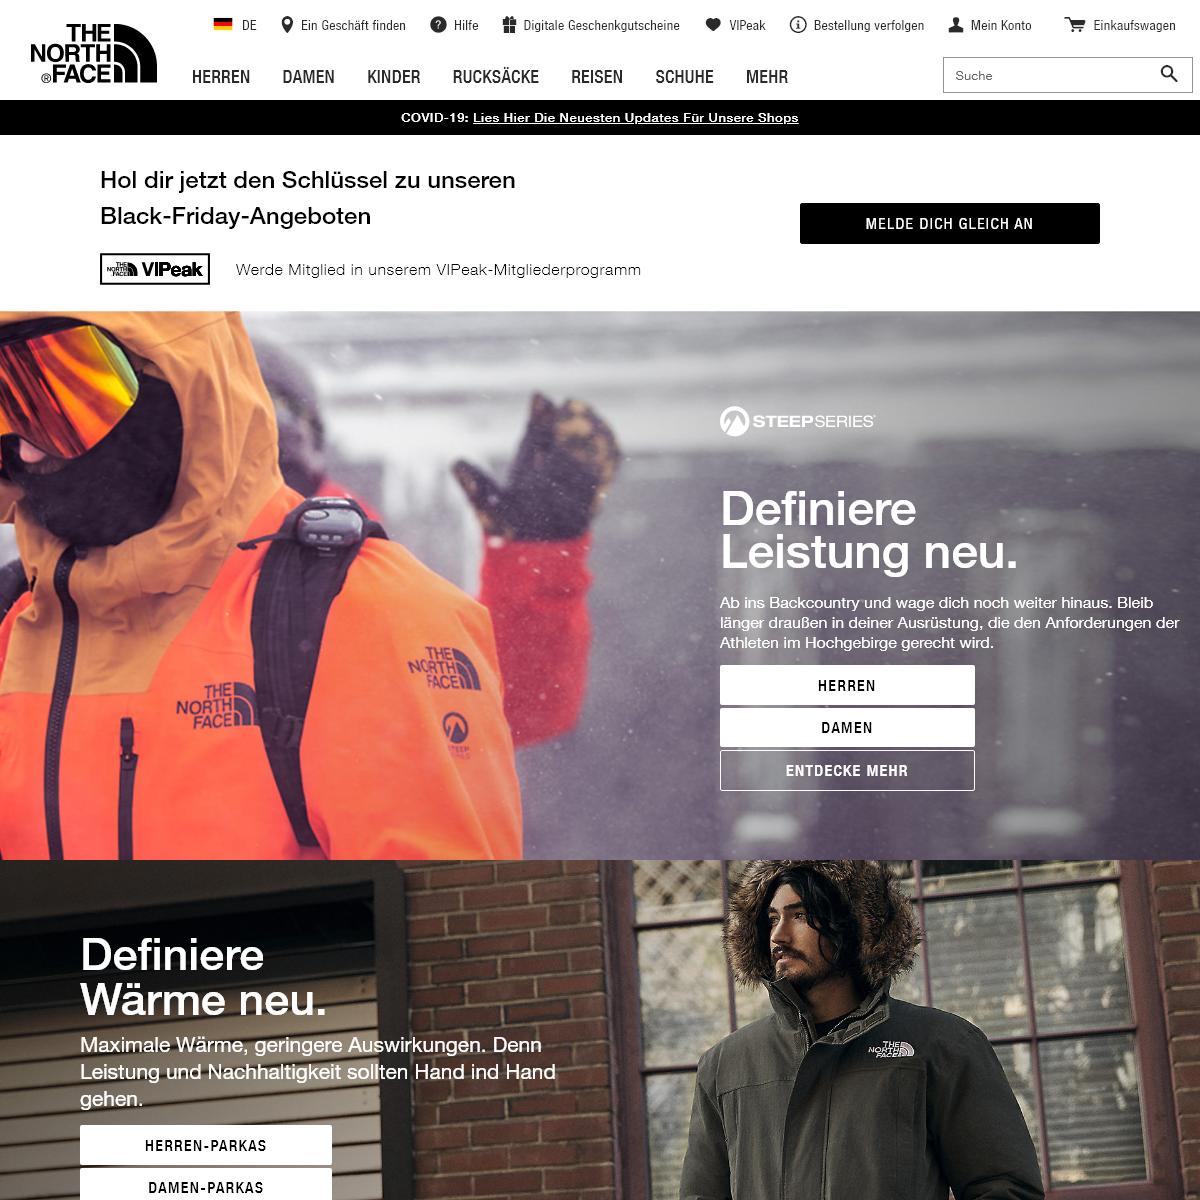 The North Face - Outdoorbekleidung, Rucksäcke & Schuhe